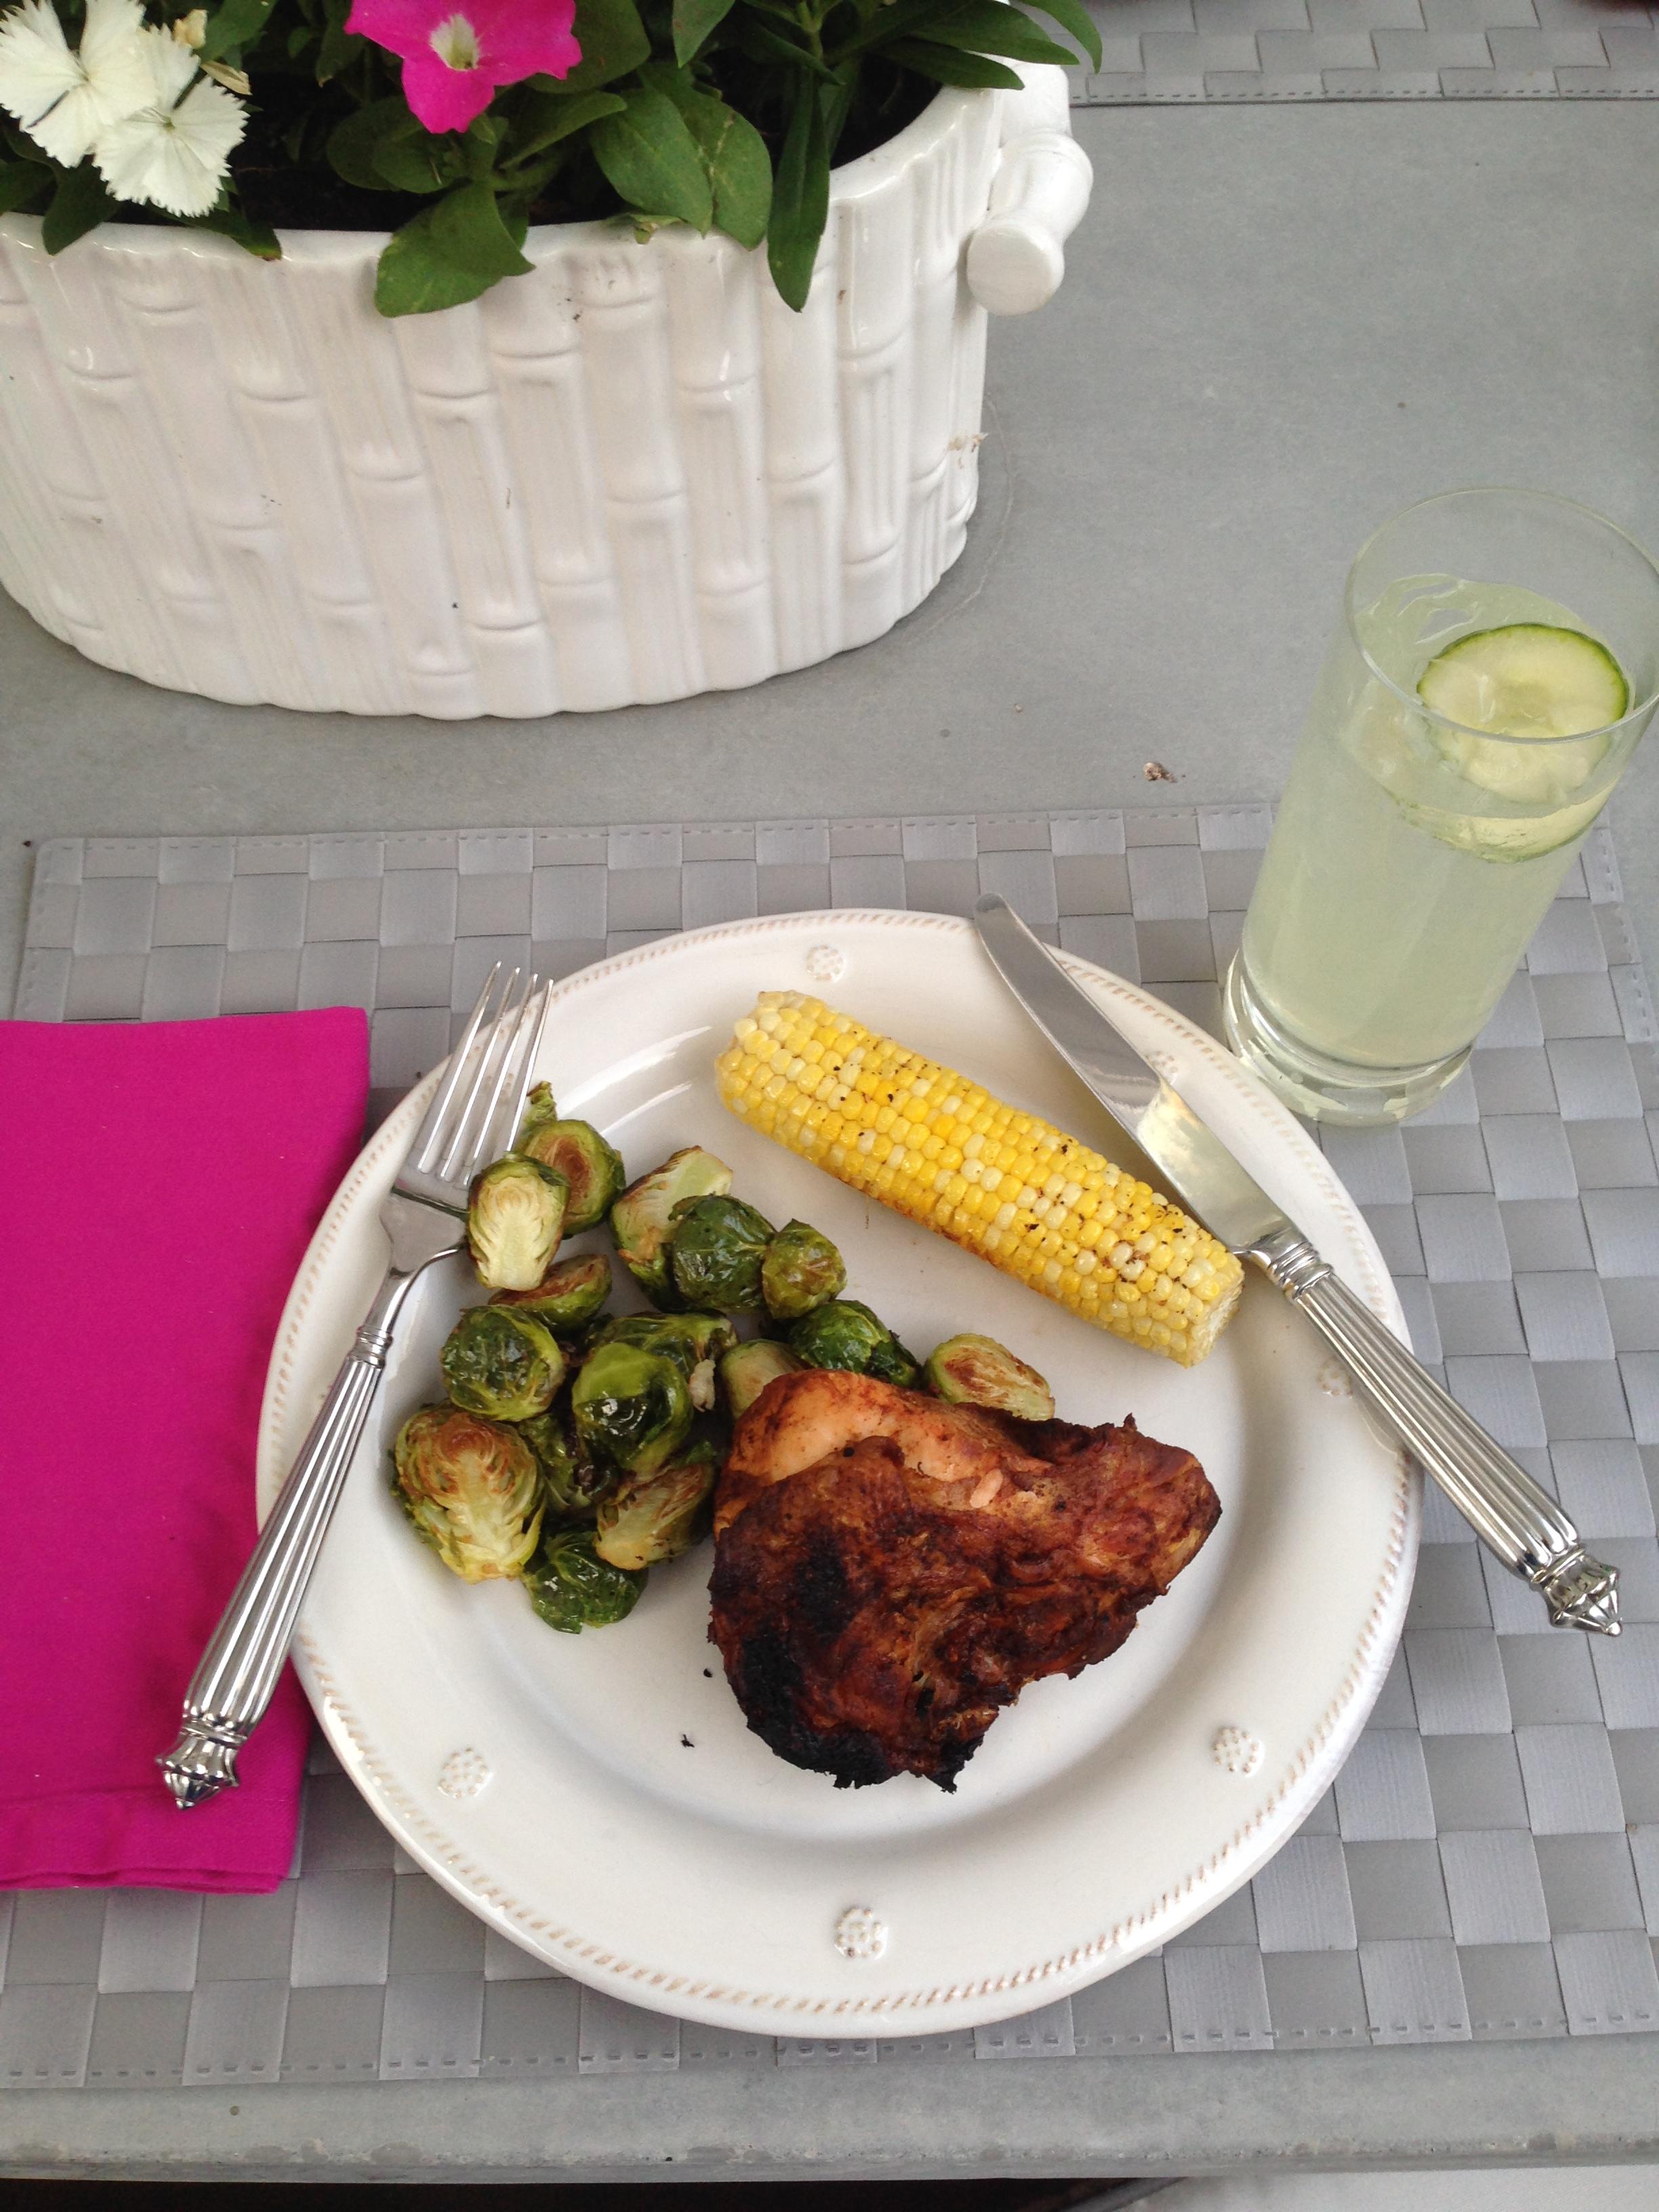 Barbecue Chicken, Best Barbecue Chicken, BBQ Chicken, Dallas Food Blogger, Wicker's Barbecue, Summer Barbecue, Summer BBQ